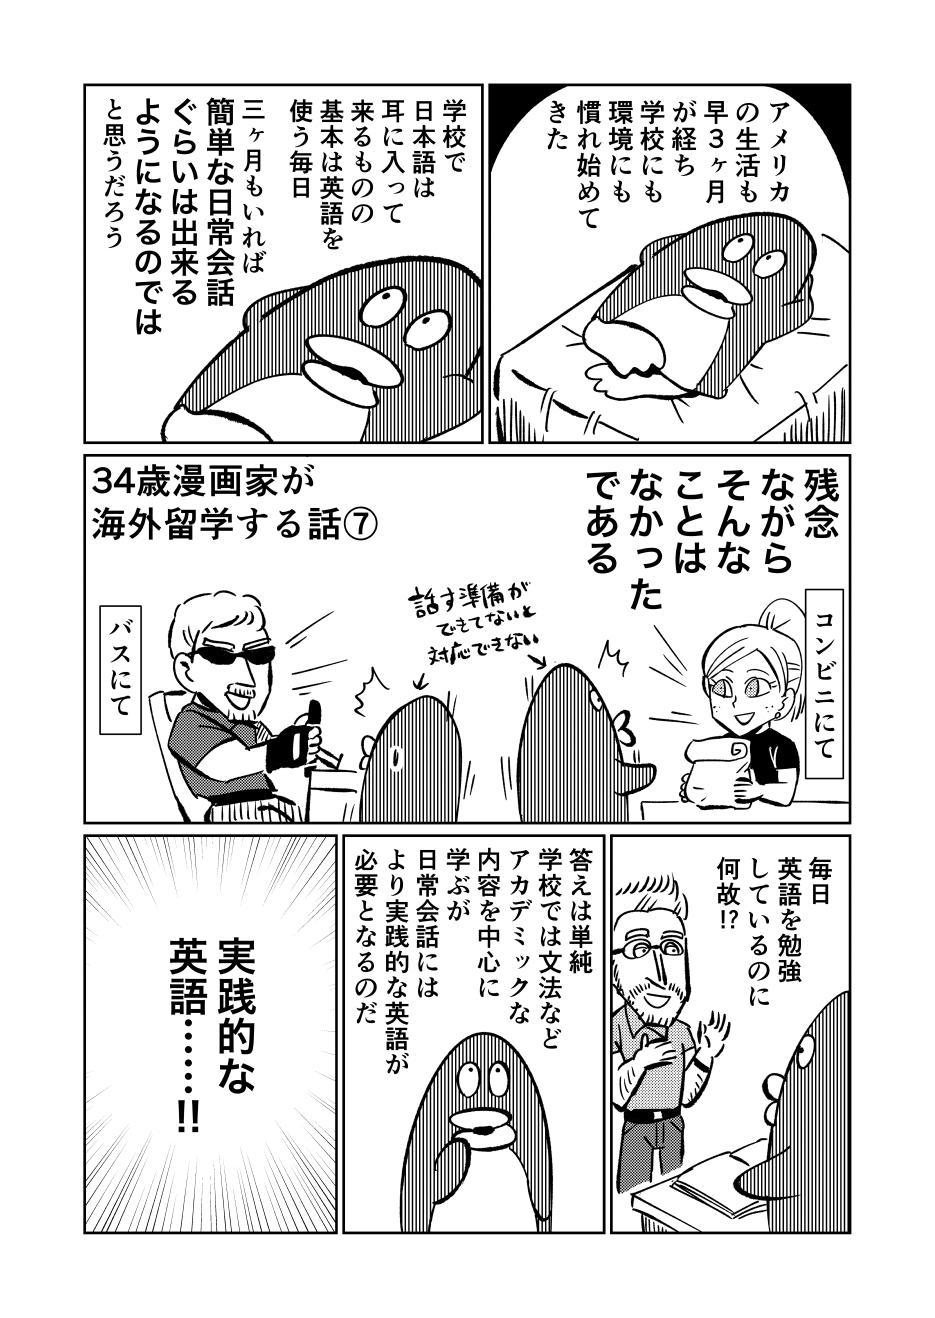 https://www.ryugaku.co.jp/blog/els_portland/upload/466C2691-4B02-46AC-83C2-EBE1EAB02FF1.jpeg